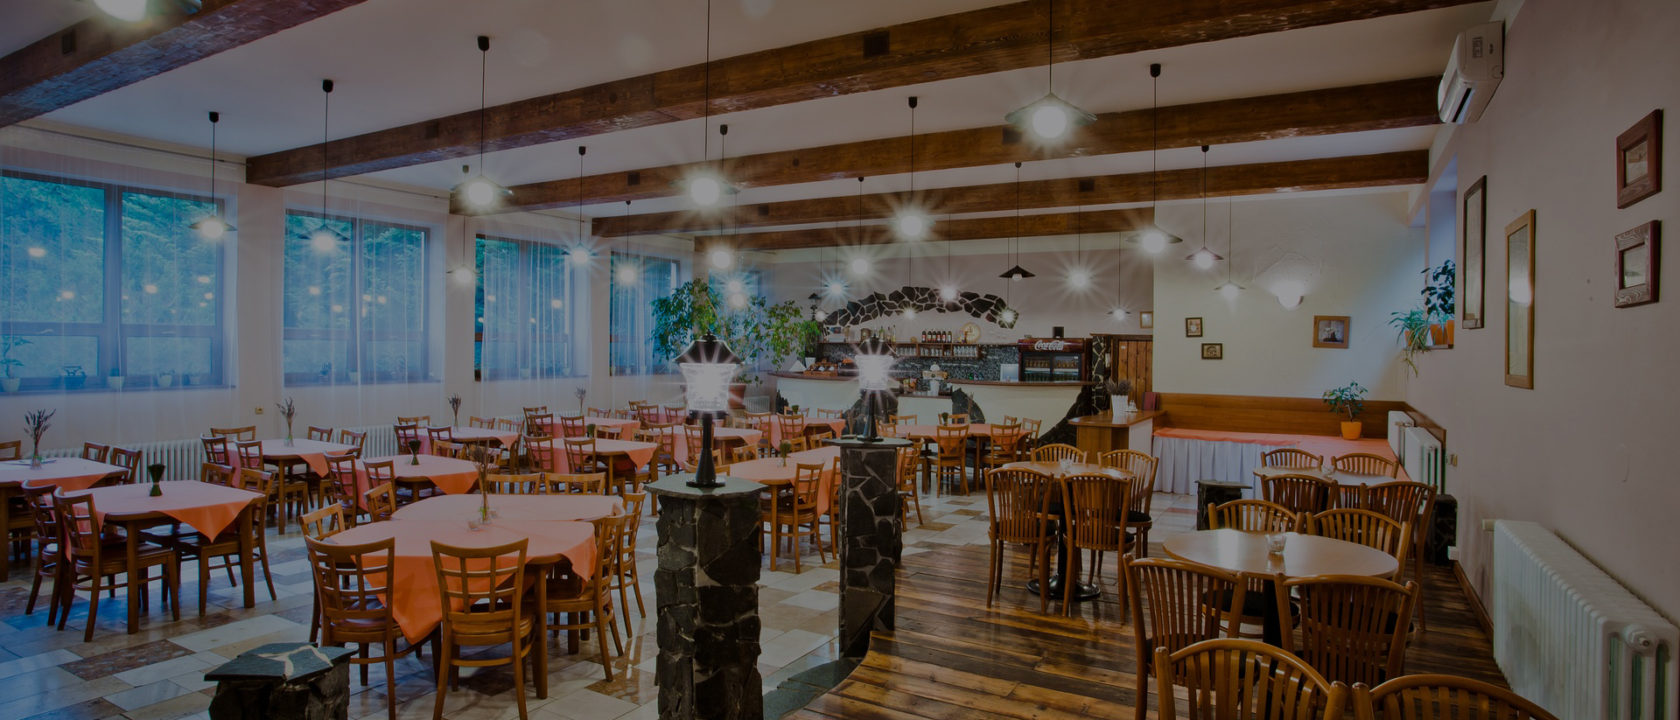 Gastronomia i hotelarstwo